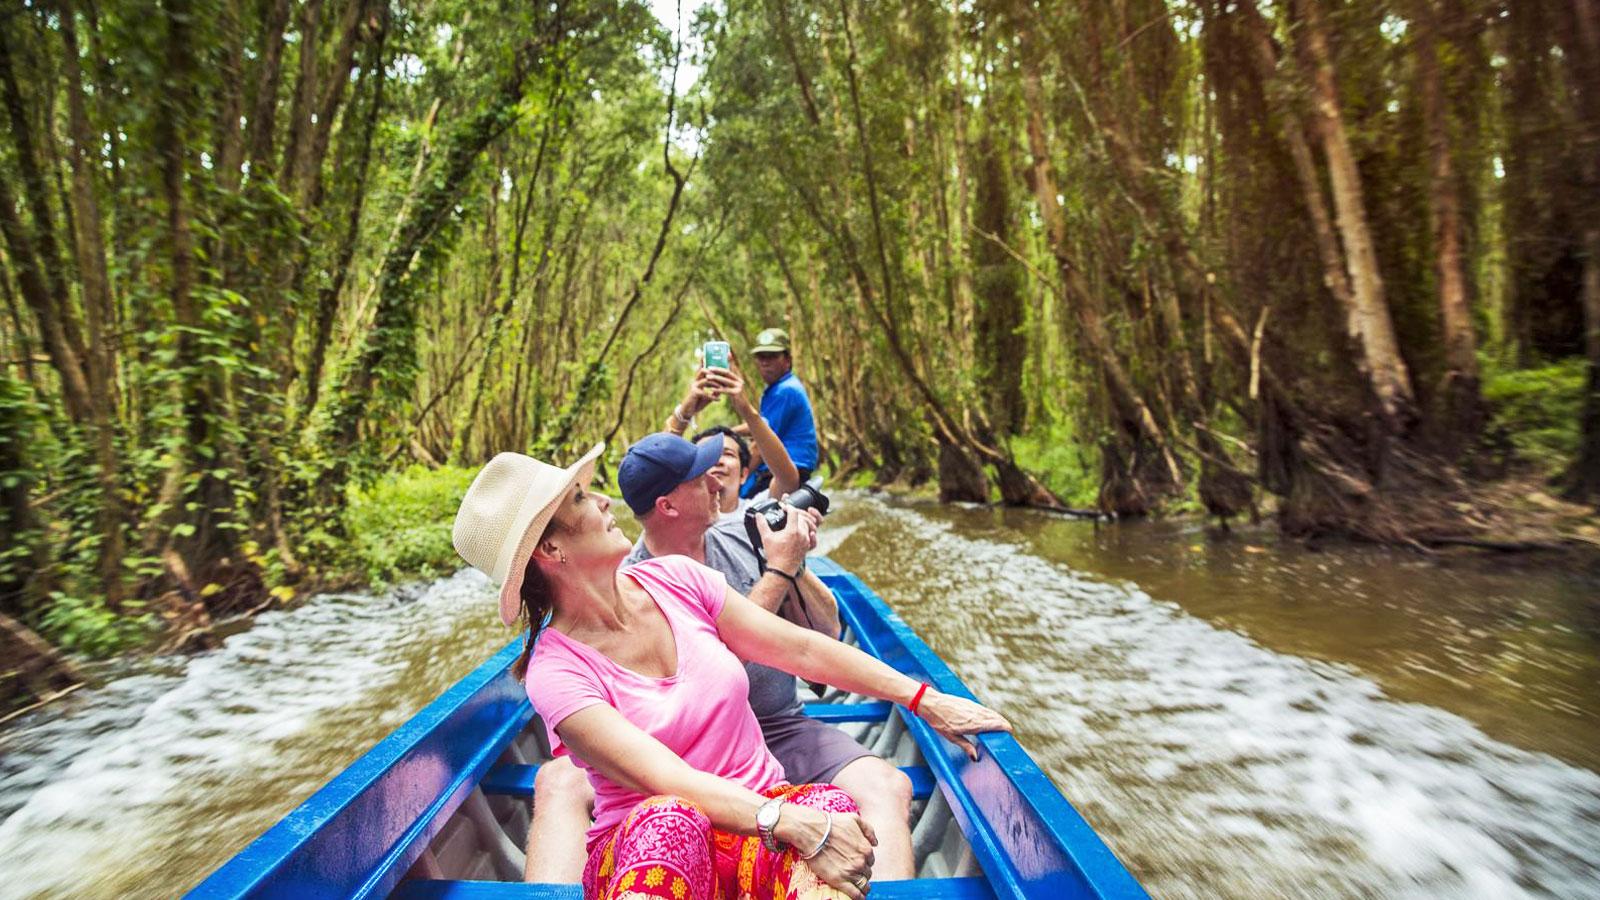 National Geographic - Vietnam Kulturreise | traveljunkies.tours